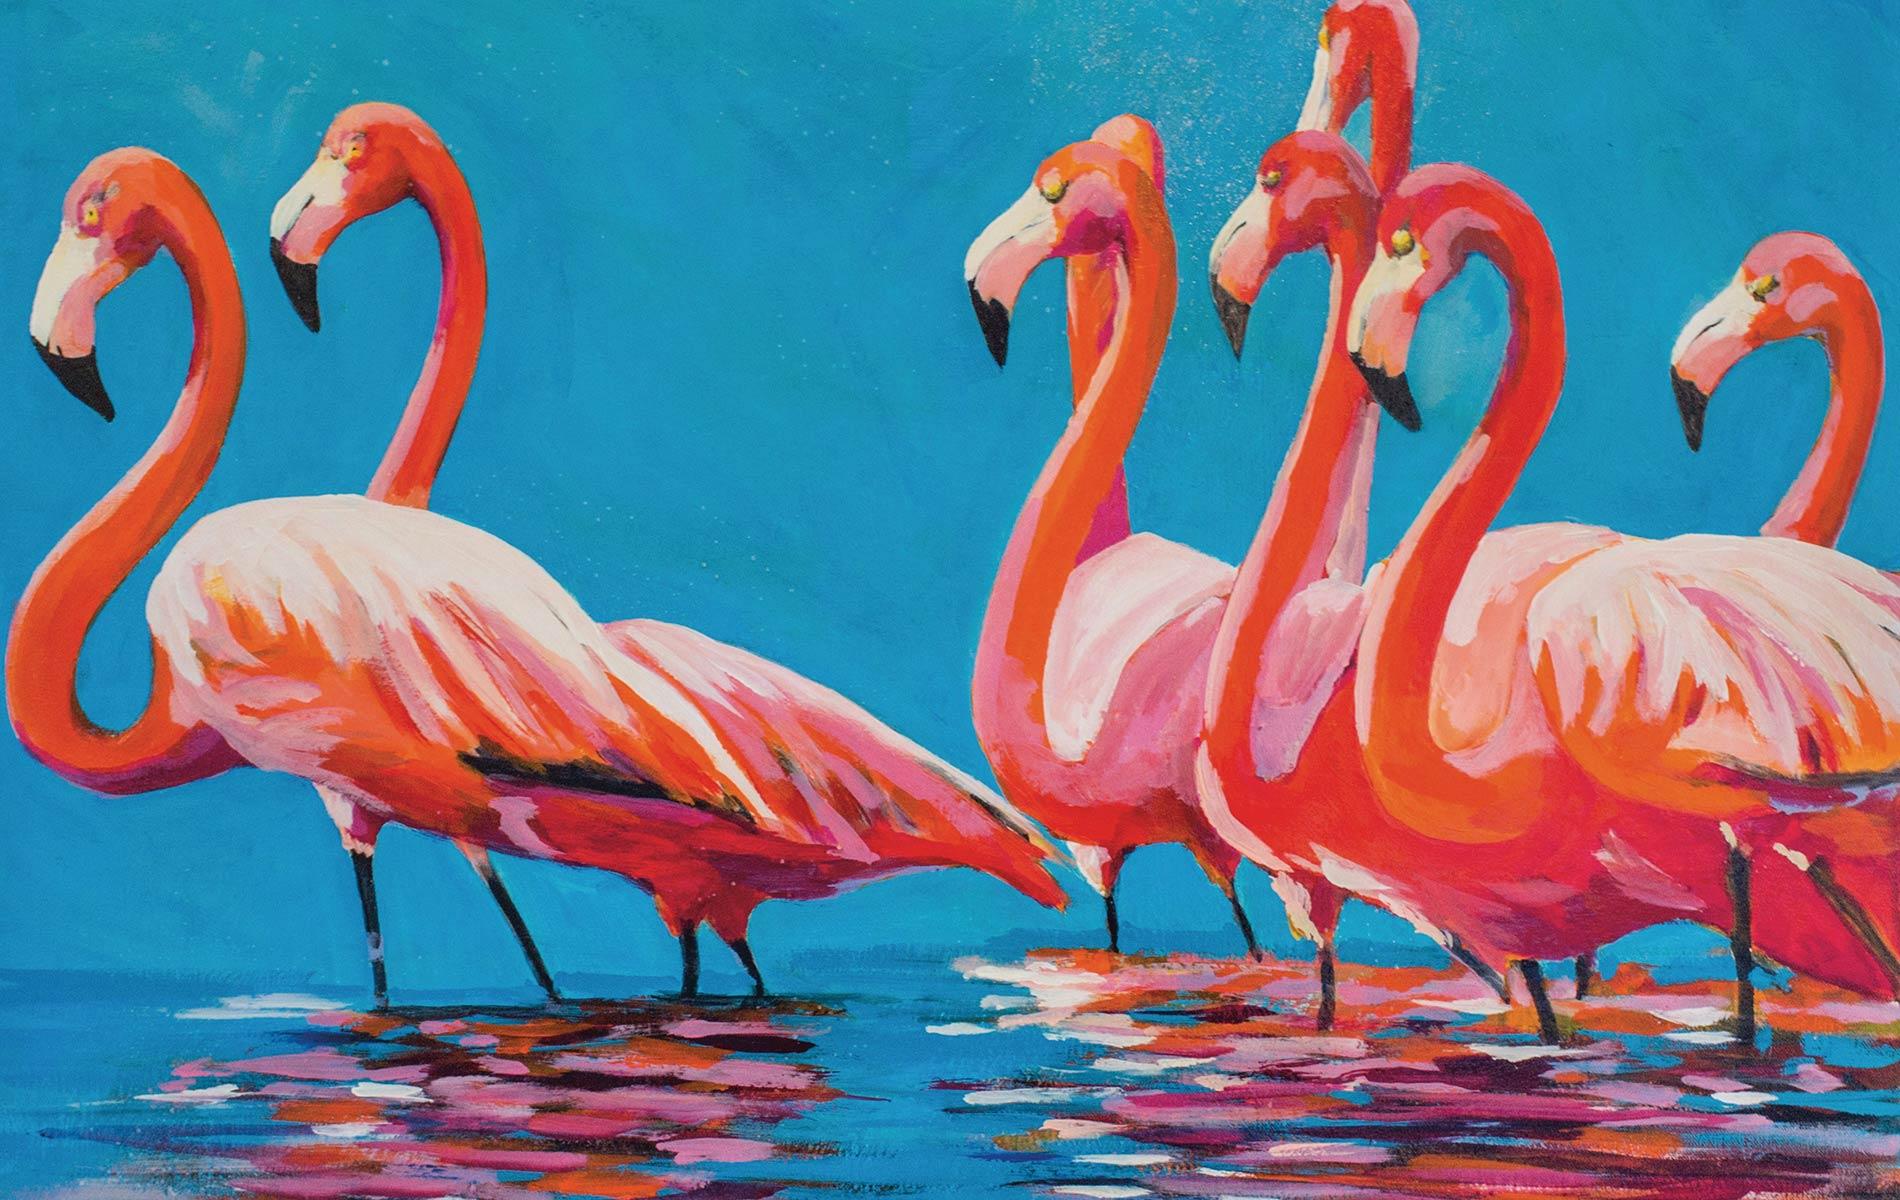 American Flamingos at Key Biscayne by Gordie Hinds art flamingos paint artist